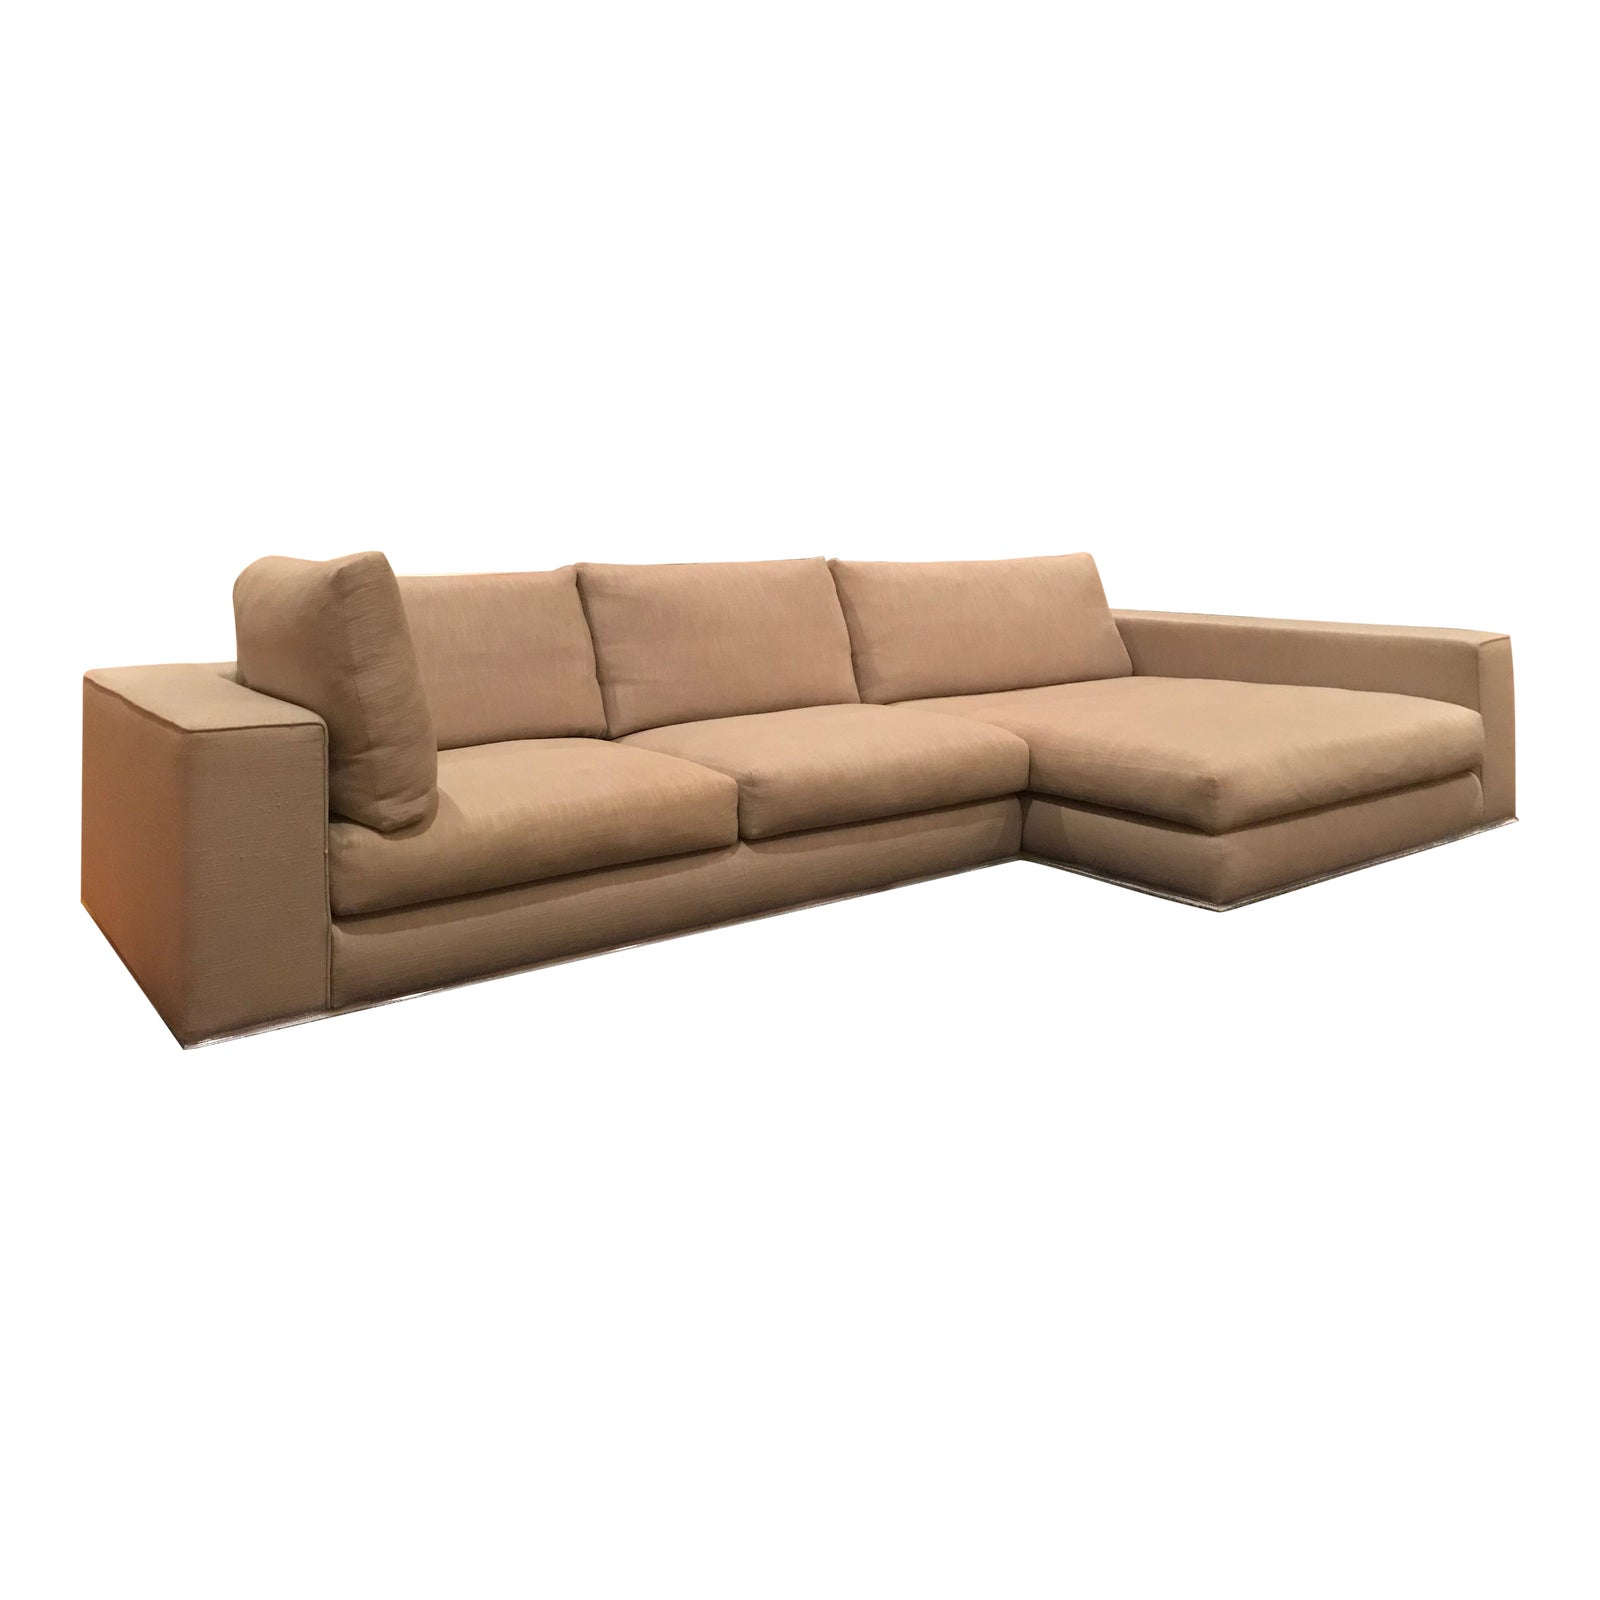 "Minotti ""Hamilton"" Italian Modern Sectional Sofa"